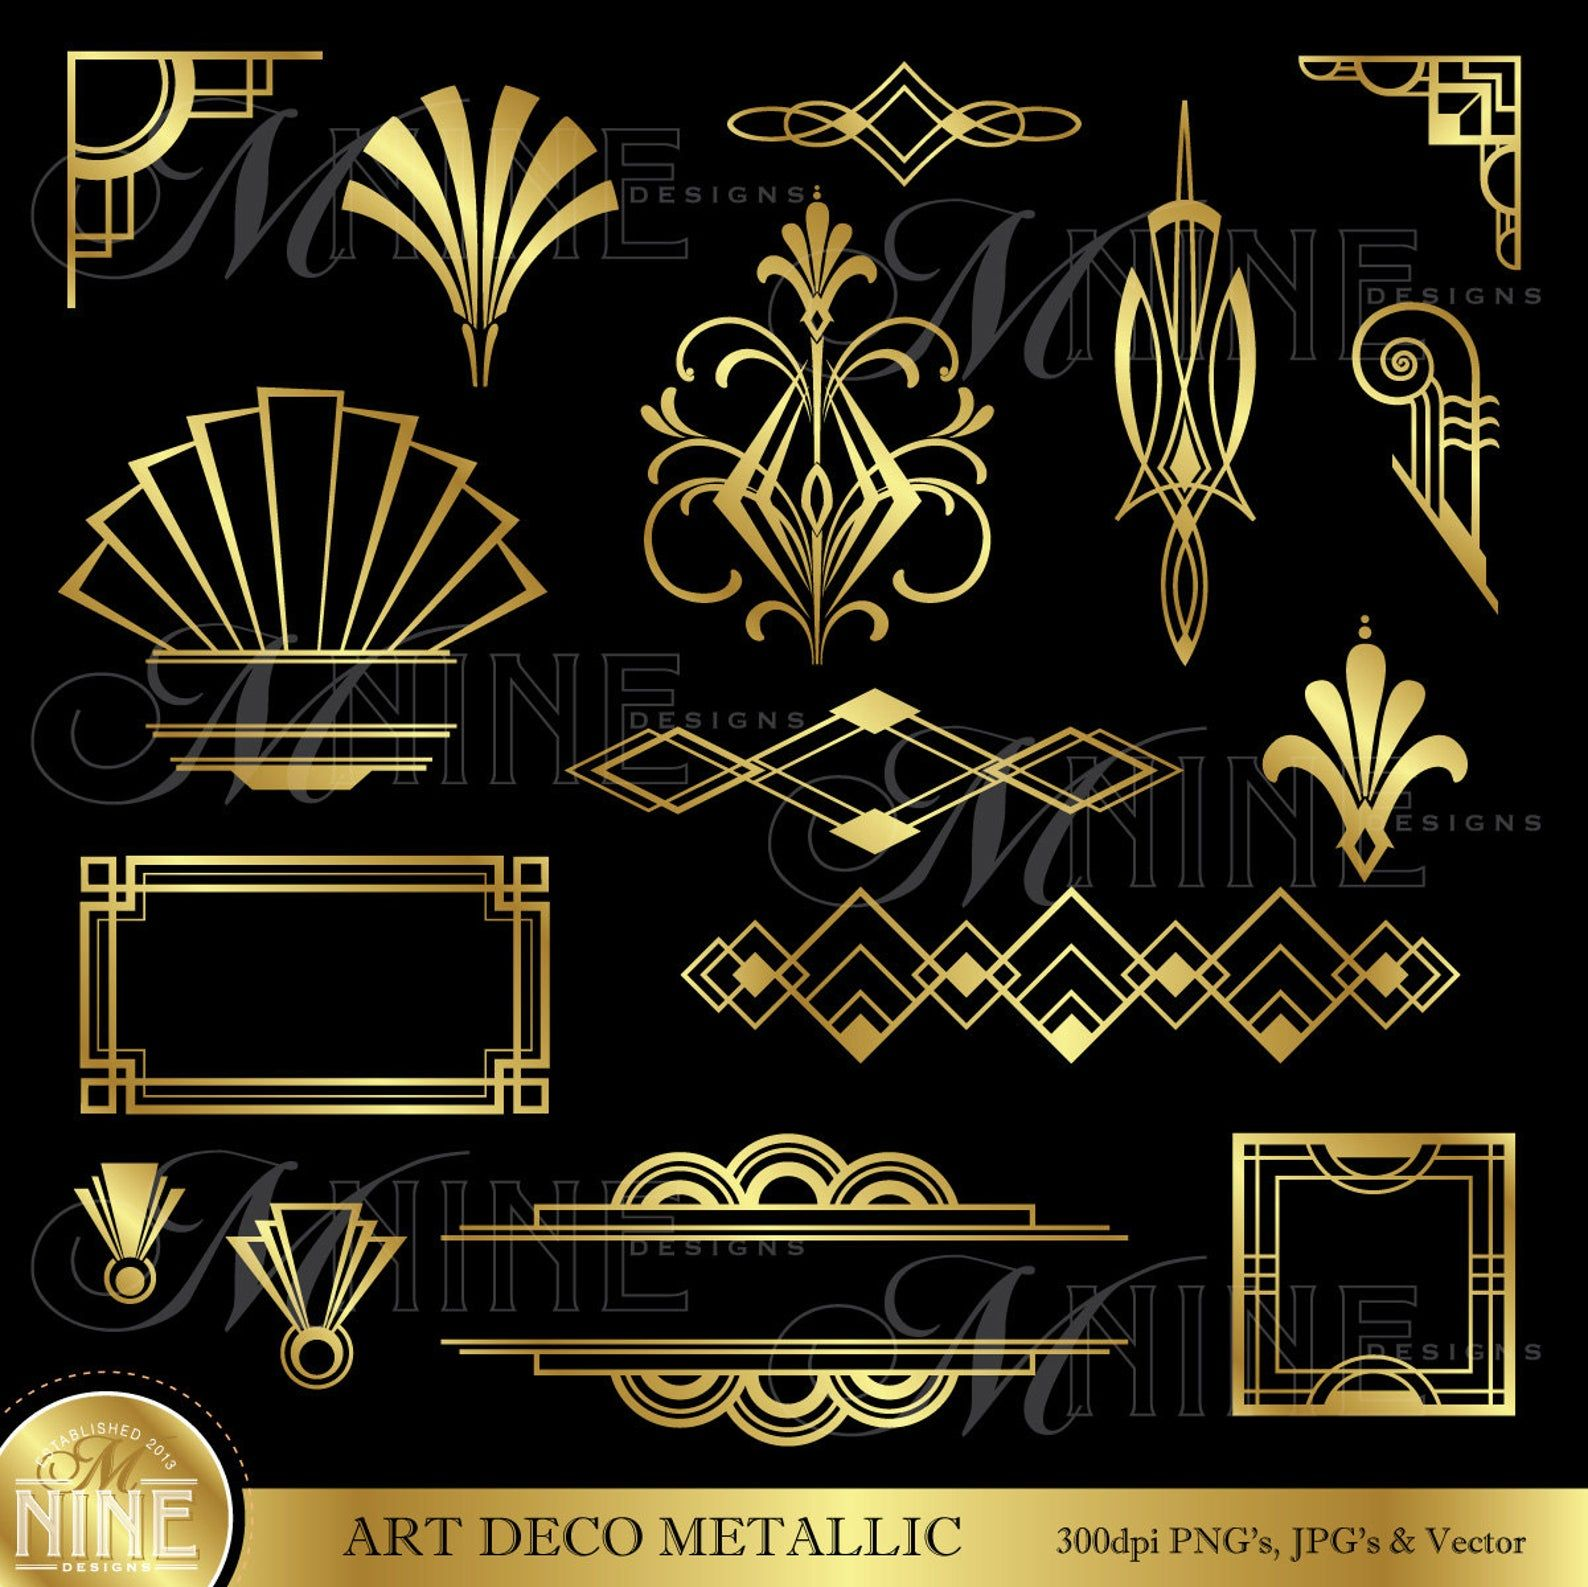 Art Deco Clip Art Gold Art Deco Accents Design Elements Digital Clipart Instant Download Vintage Accents Frame Borders Vector Svg Png Art Deco Borders Art Deco Pattern Art Deco Tattoo